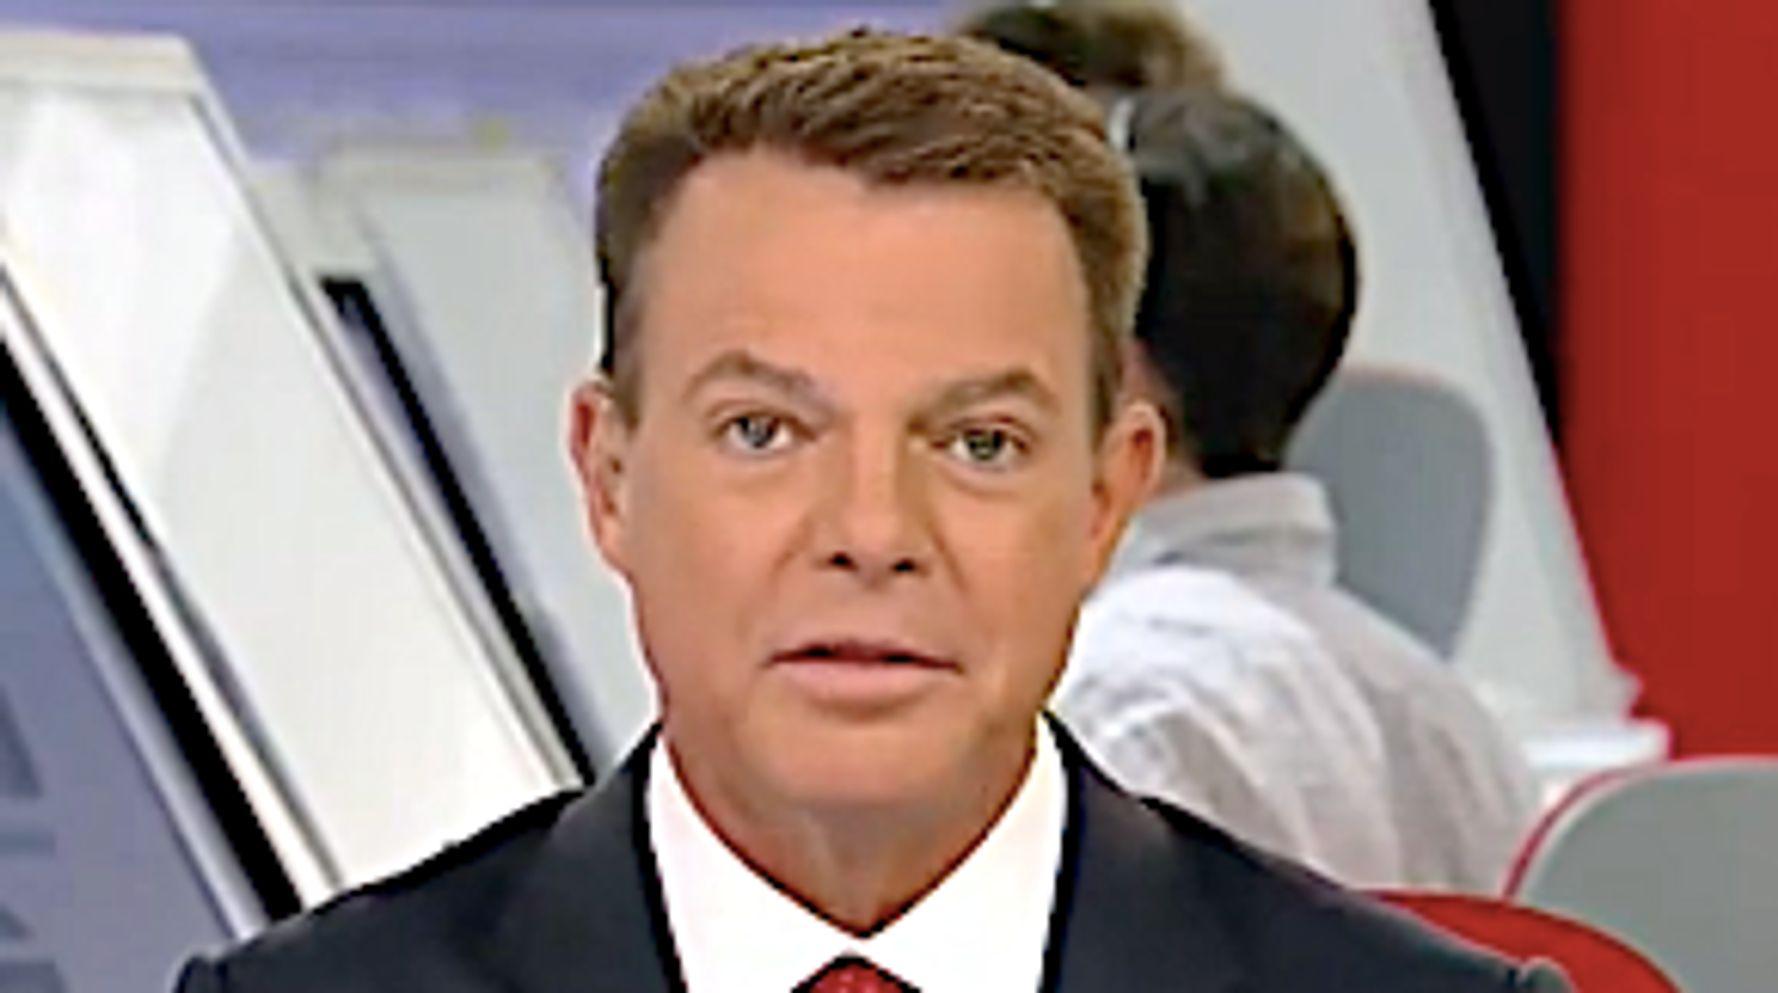 Fox News' Shepard Smith Rips Trump's Hurricane Dorian